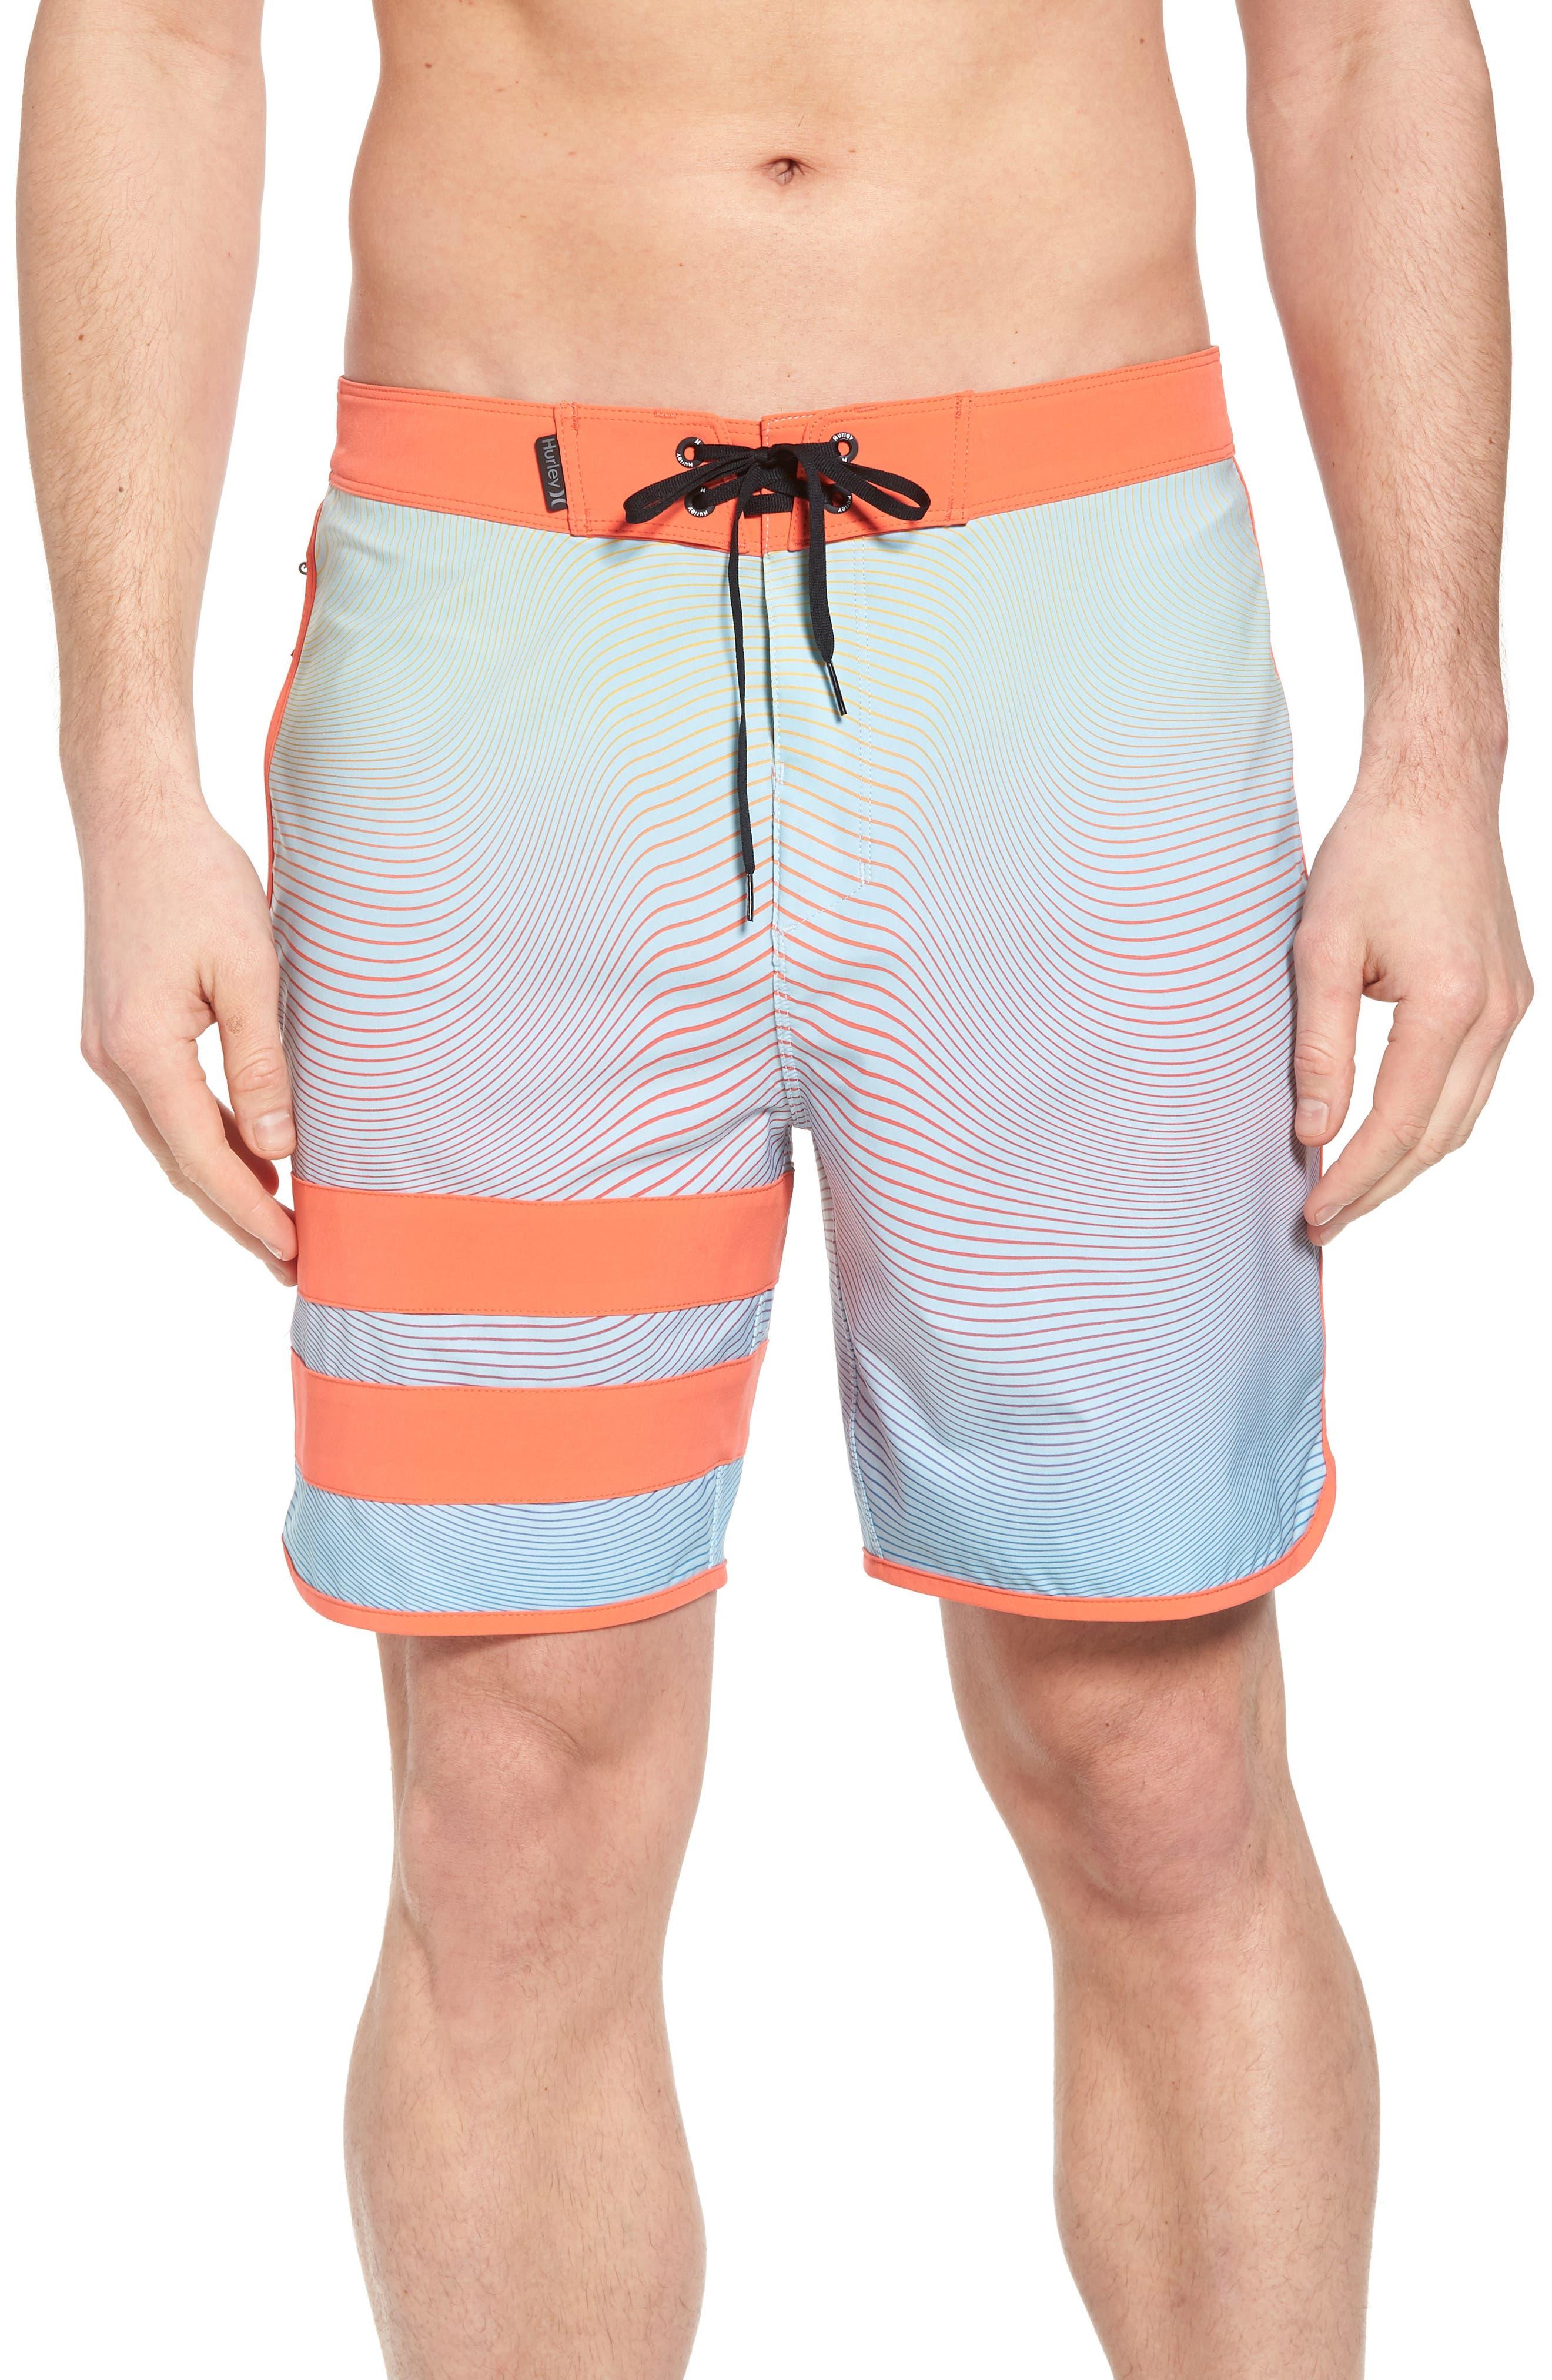 Hurley Phantom Static Block Party Board Shorts In Ocean Bliss ... c40501ed0b7